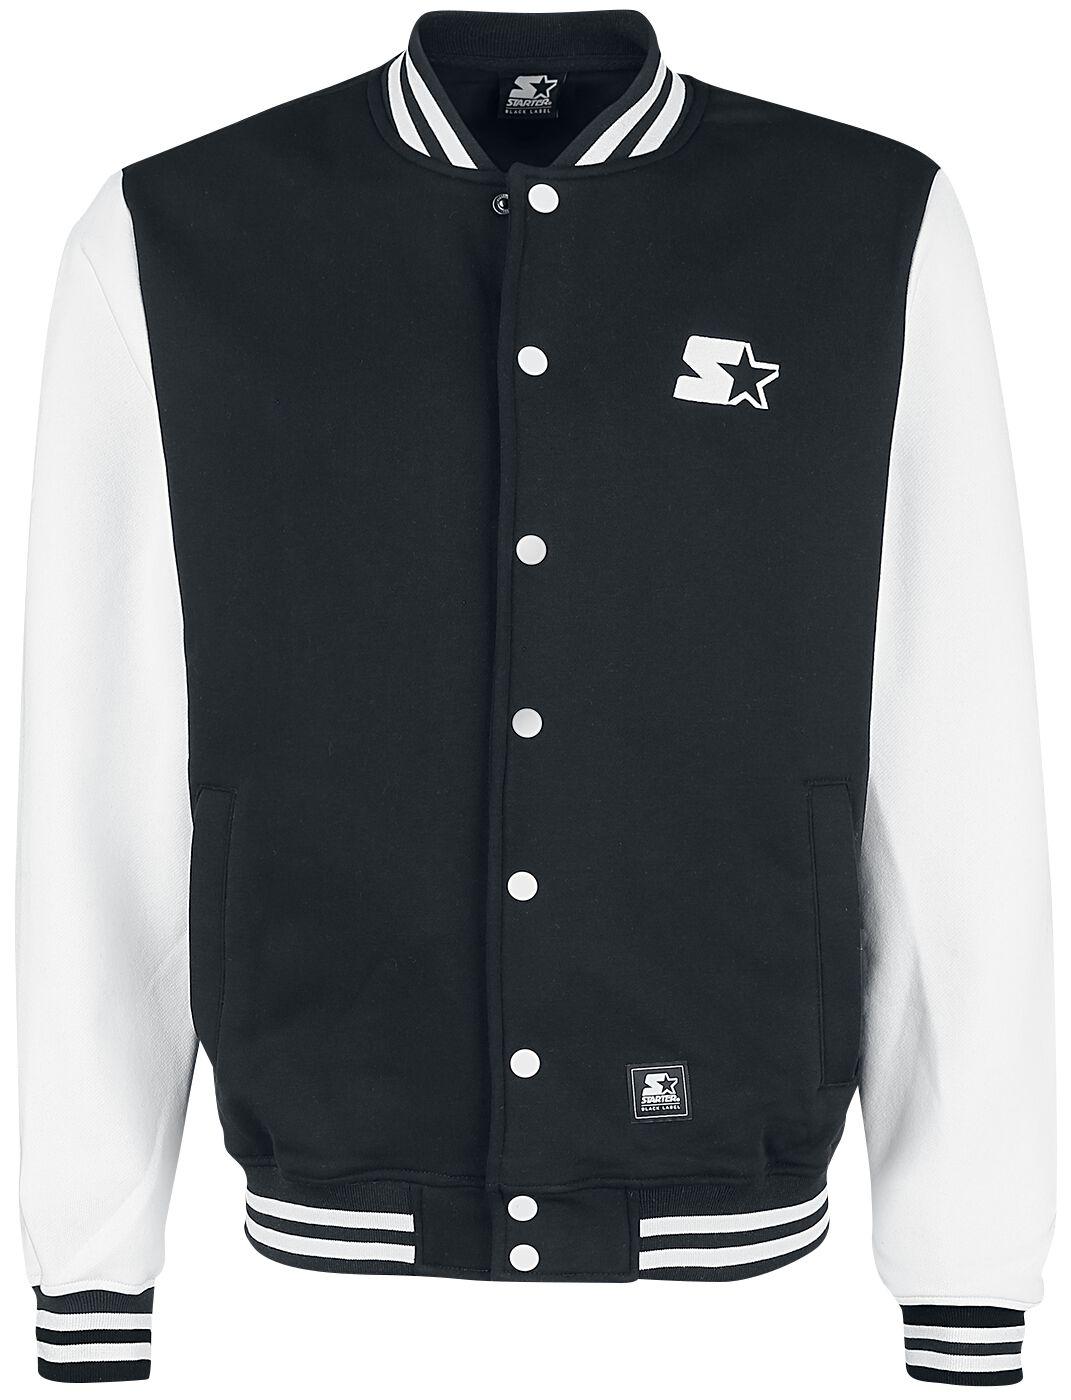 Starter College Fleece Jacket Collegejacke schwarz weiß ST107